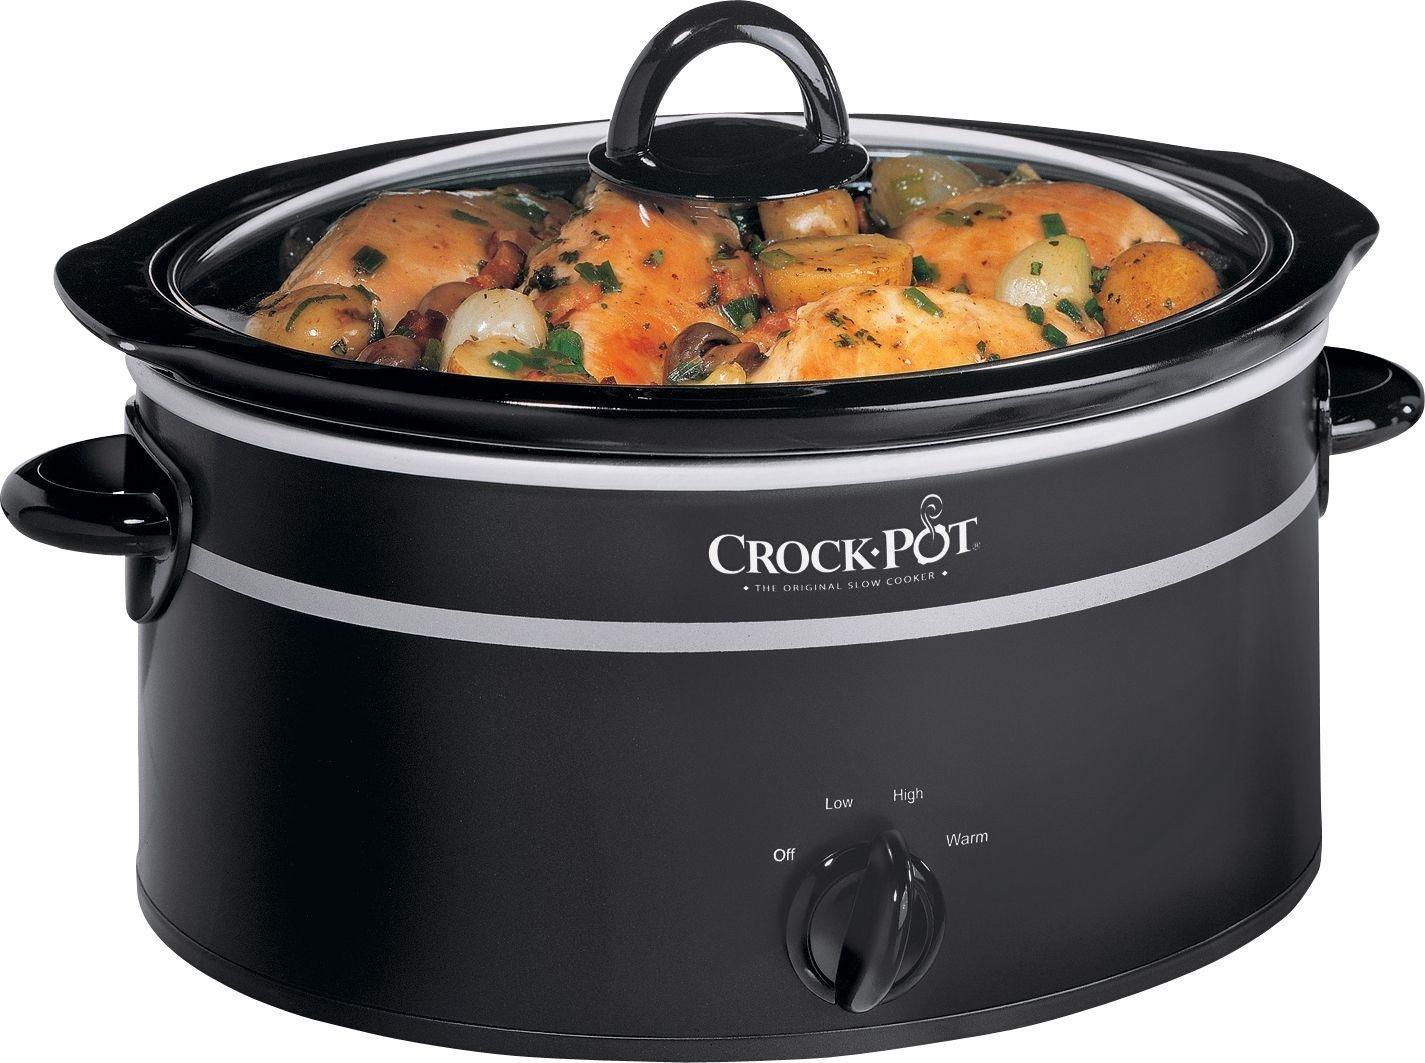 Crock-Pot 6.5L Slow Cooker - Black